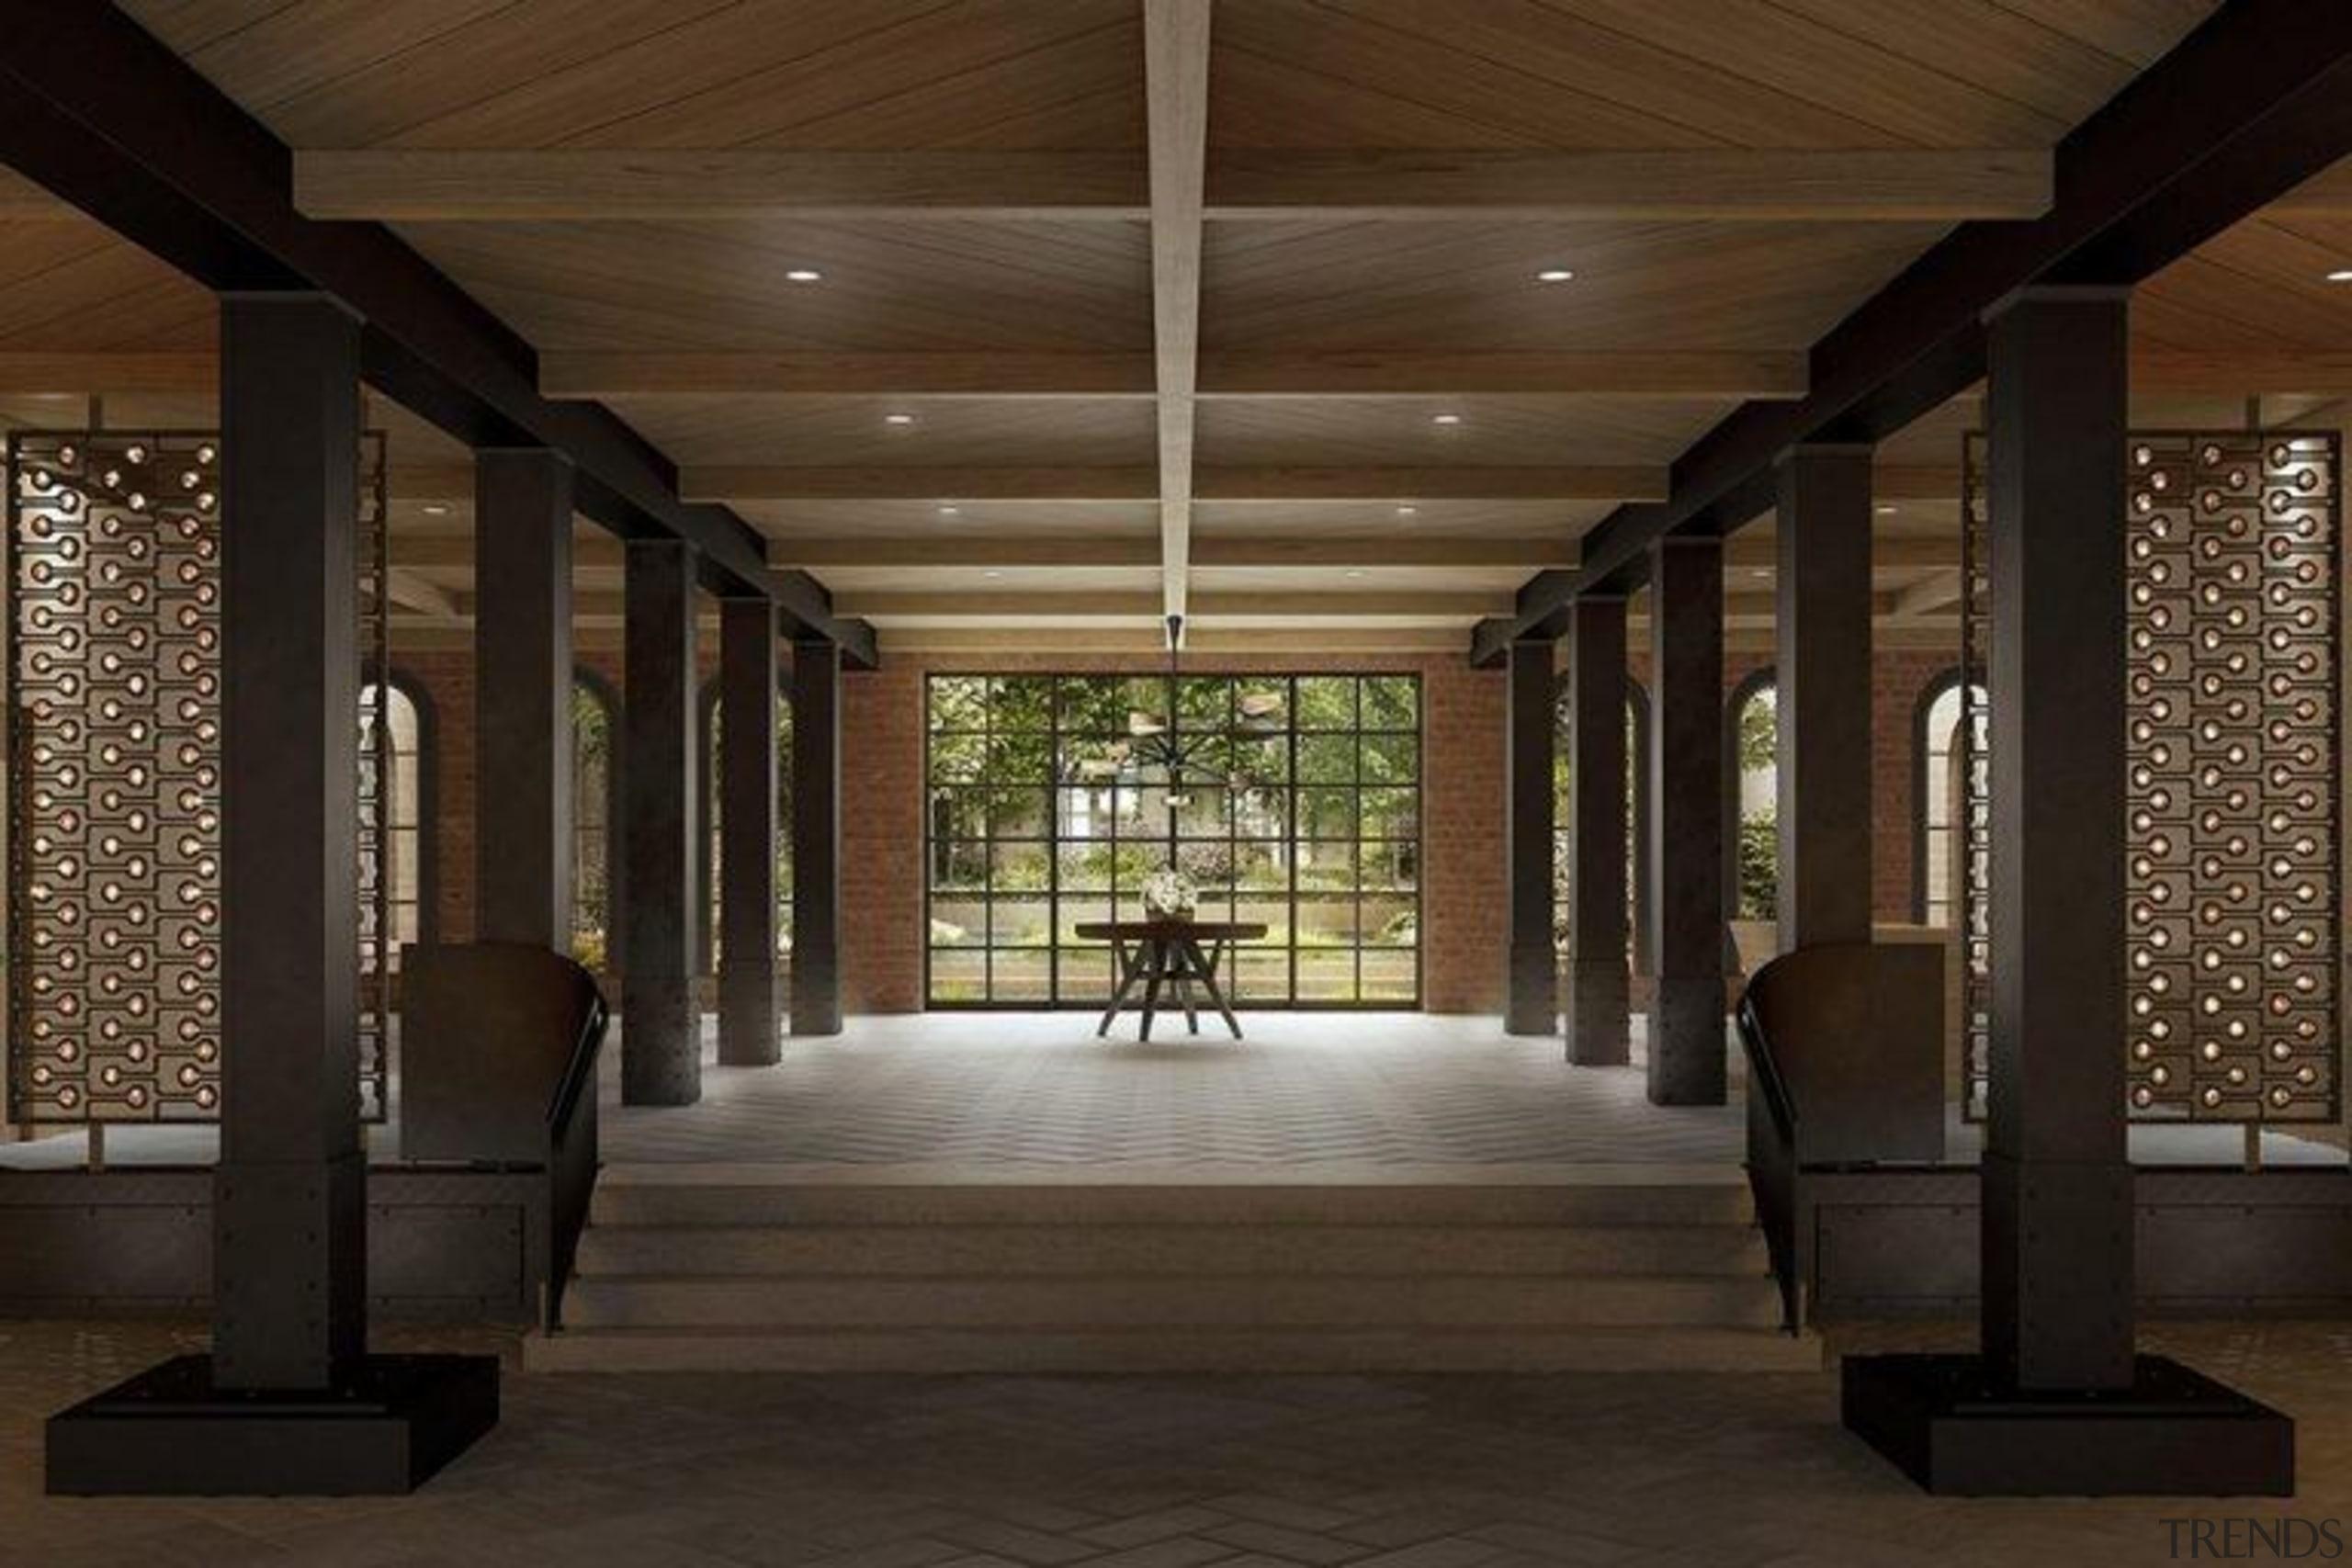 Original story from Trulia ceiling, interior design, lobby, brown, black